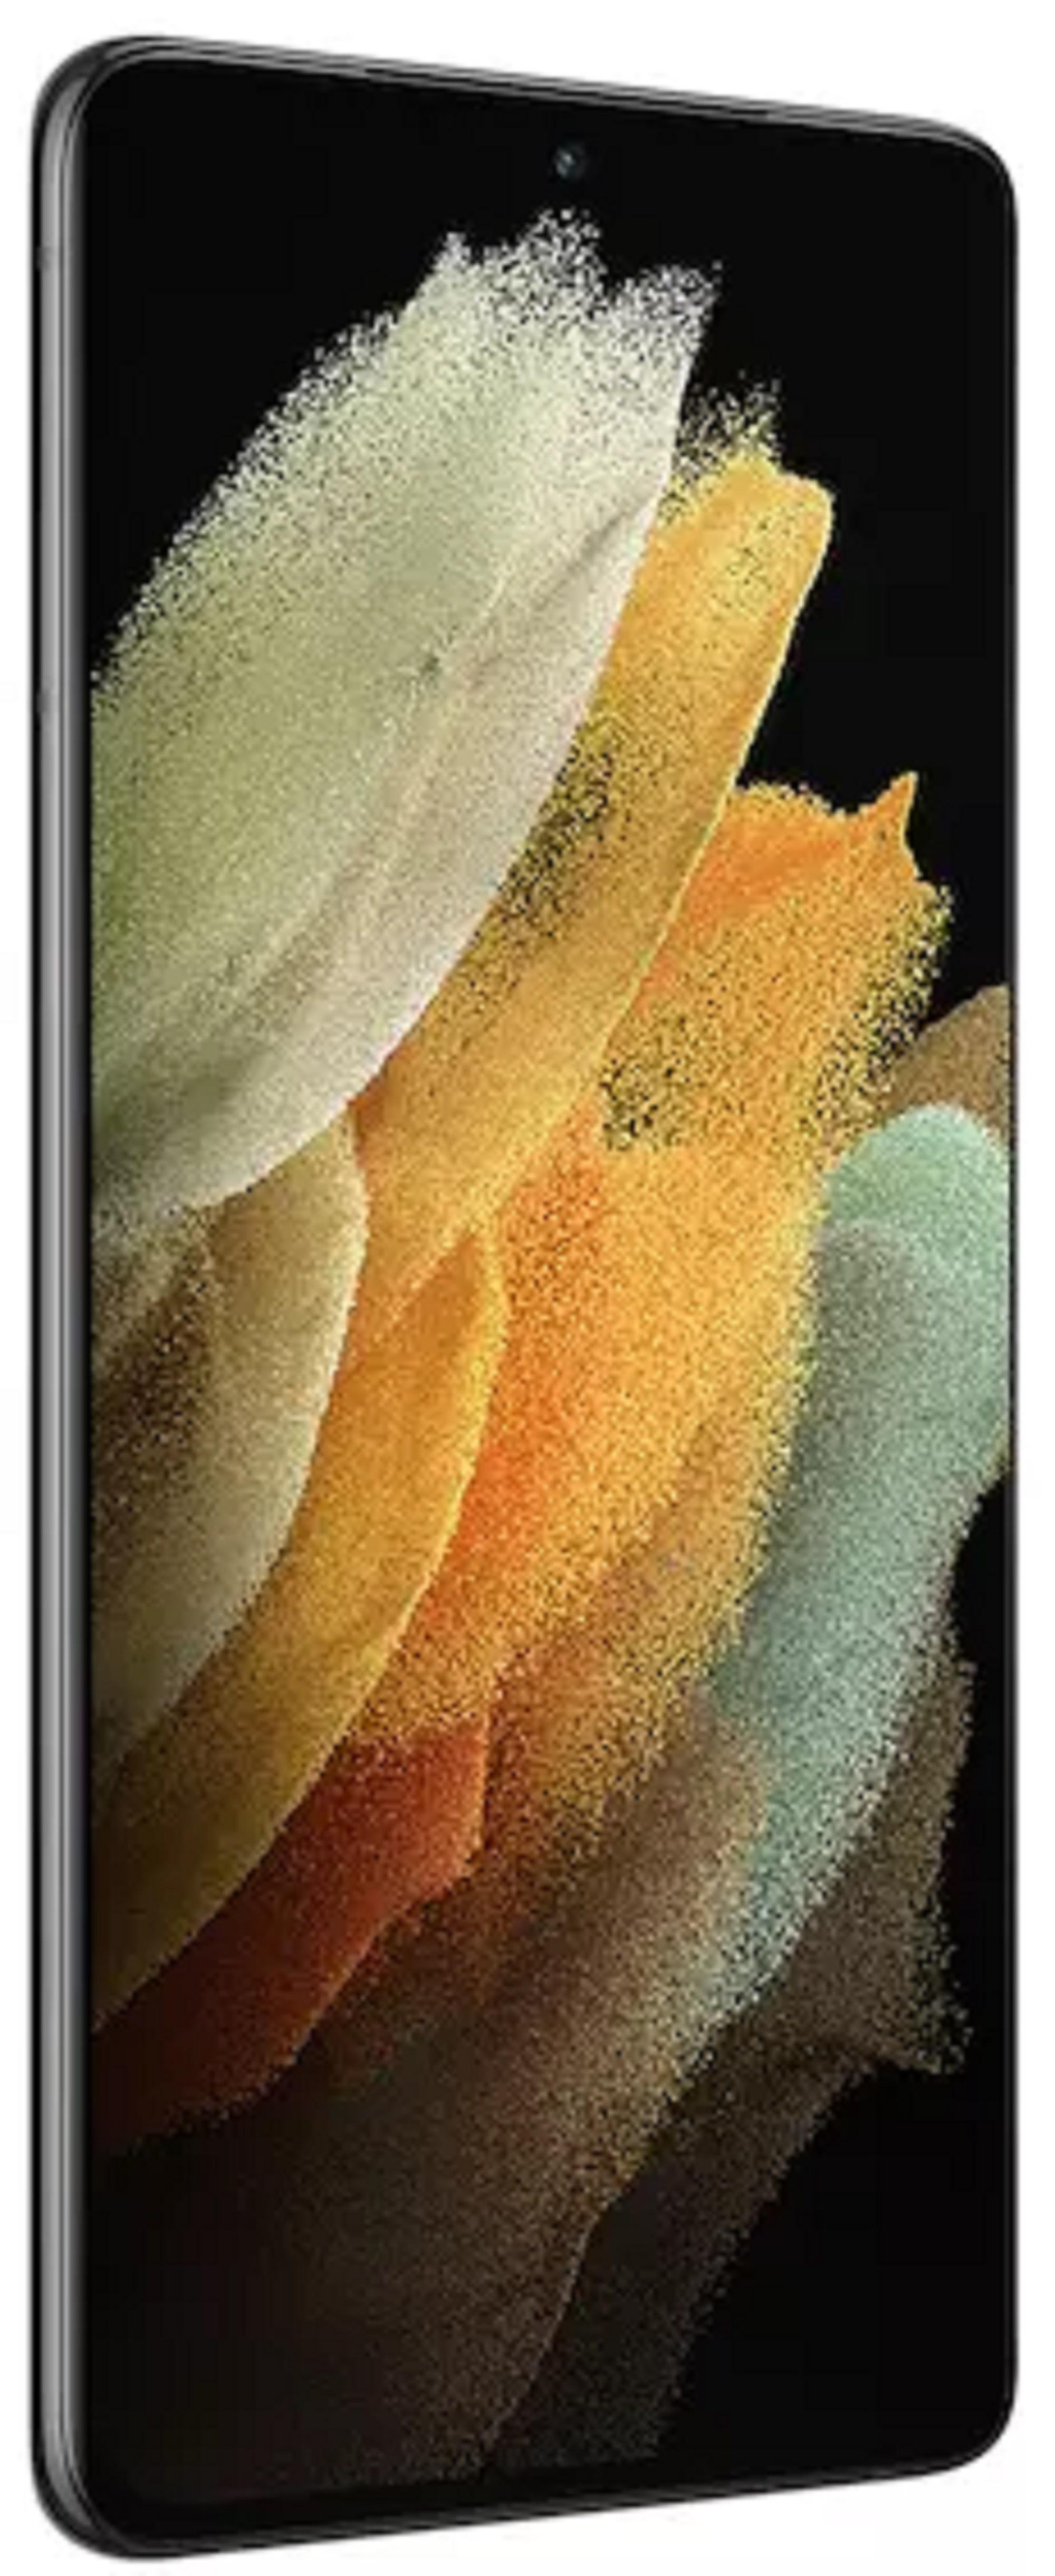 thumbnail 24 - Samsung Galaxy G998U S21 Ultra 5G 128GB Unlocked Smartphone - Excellent